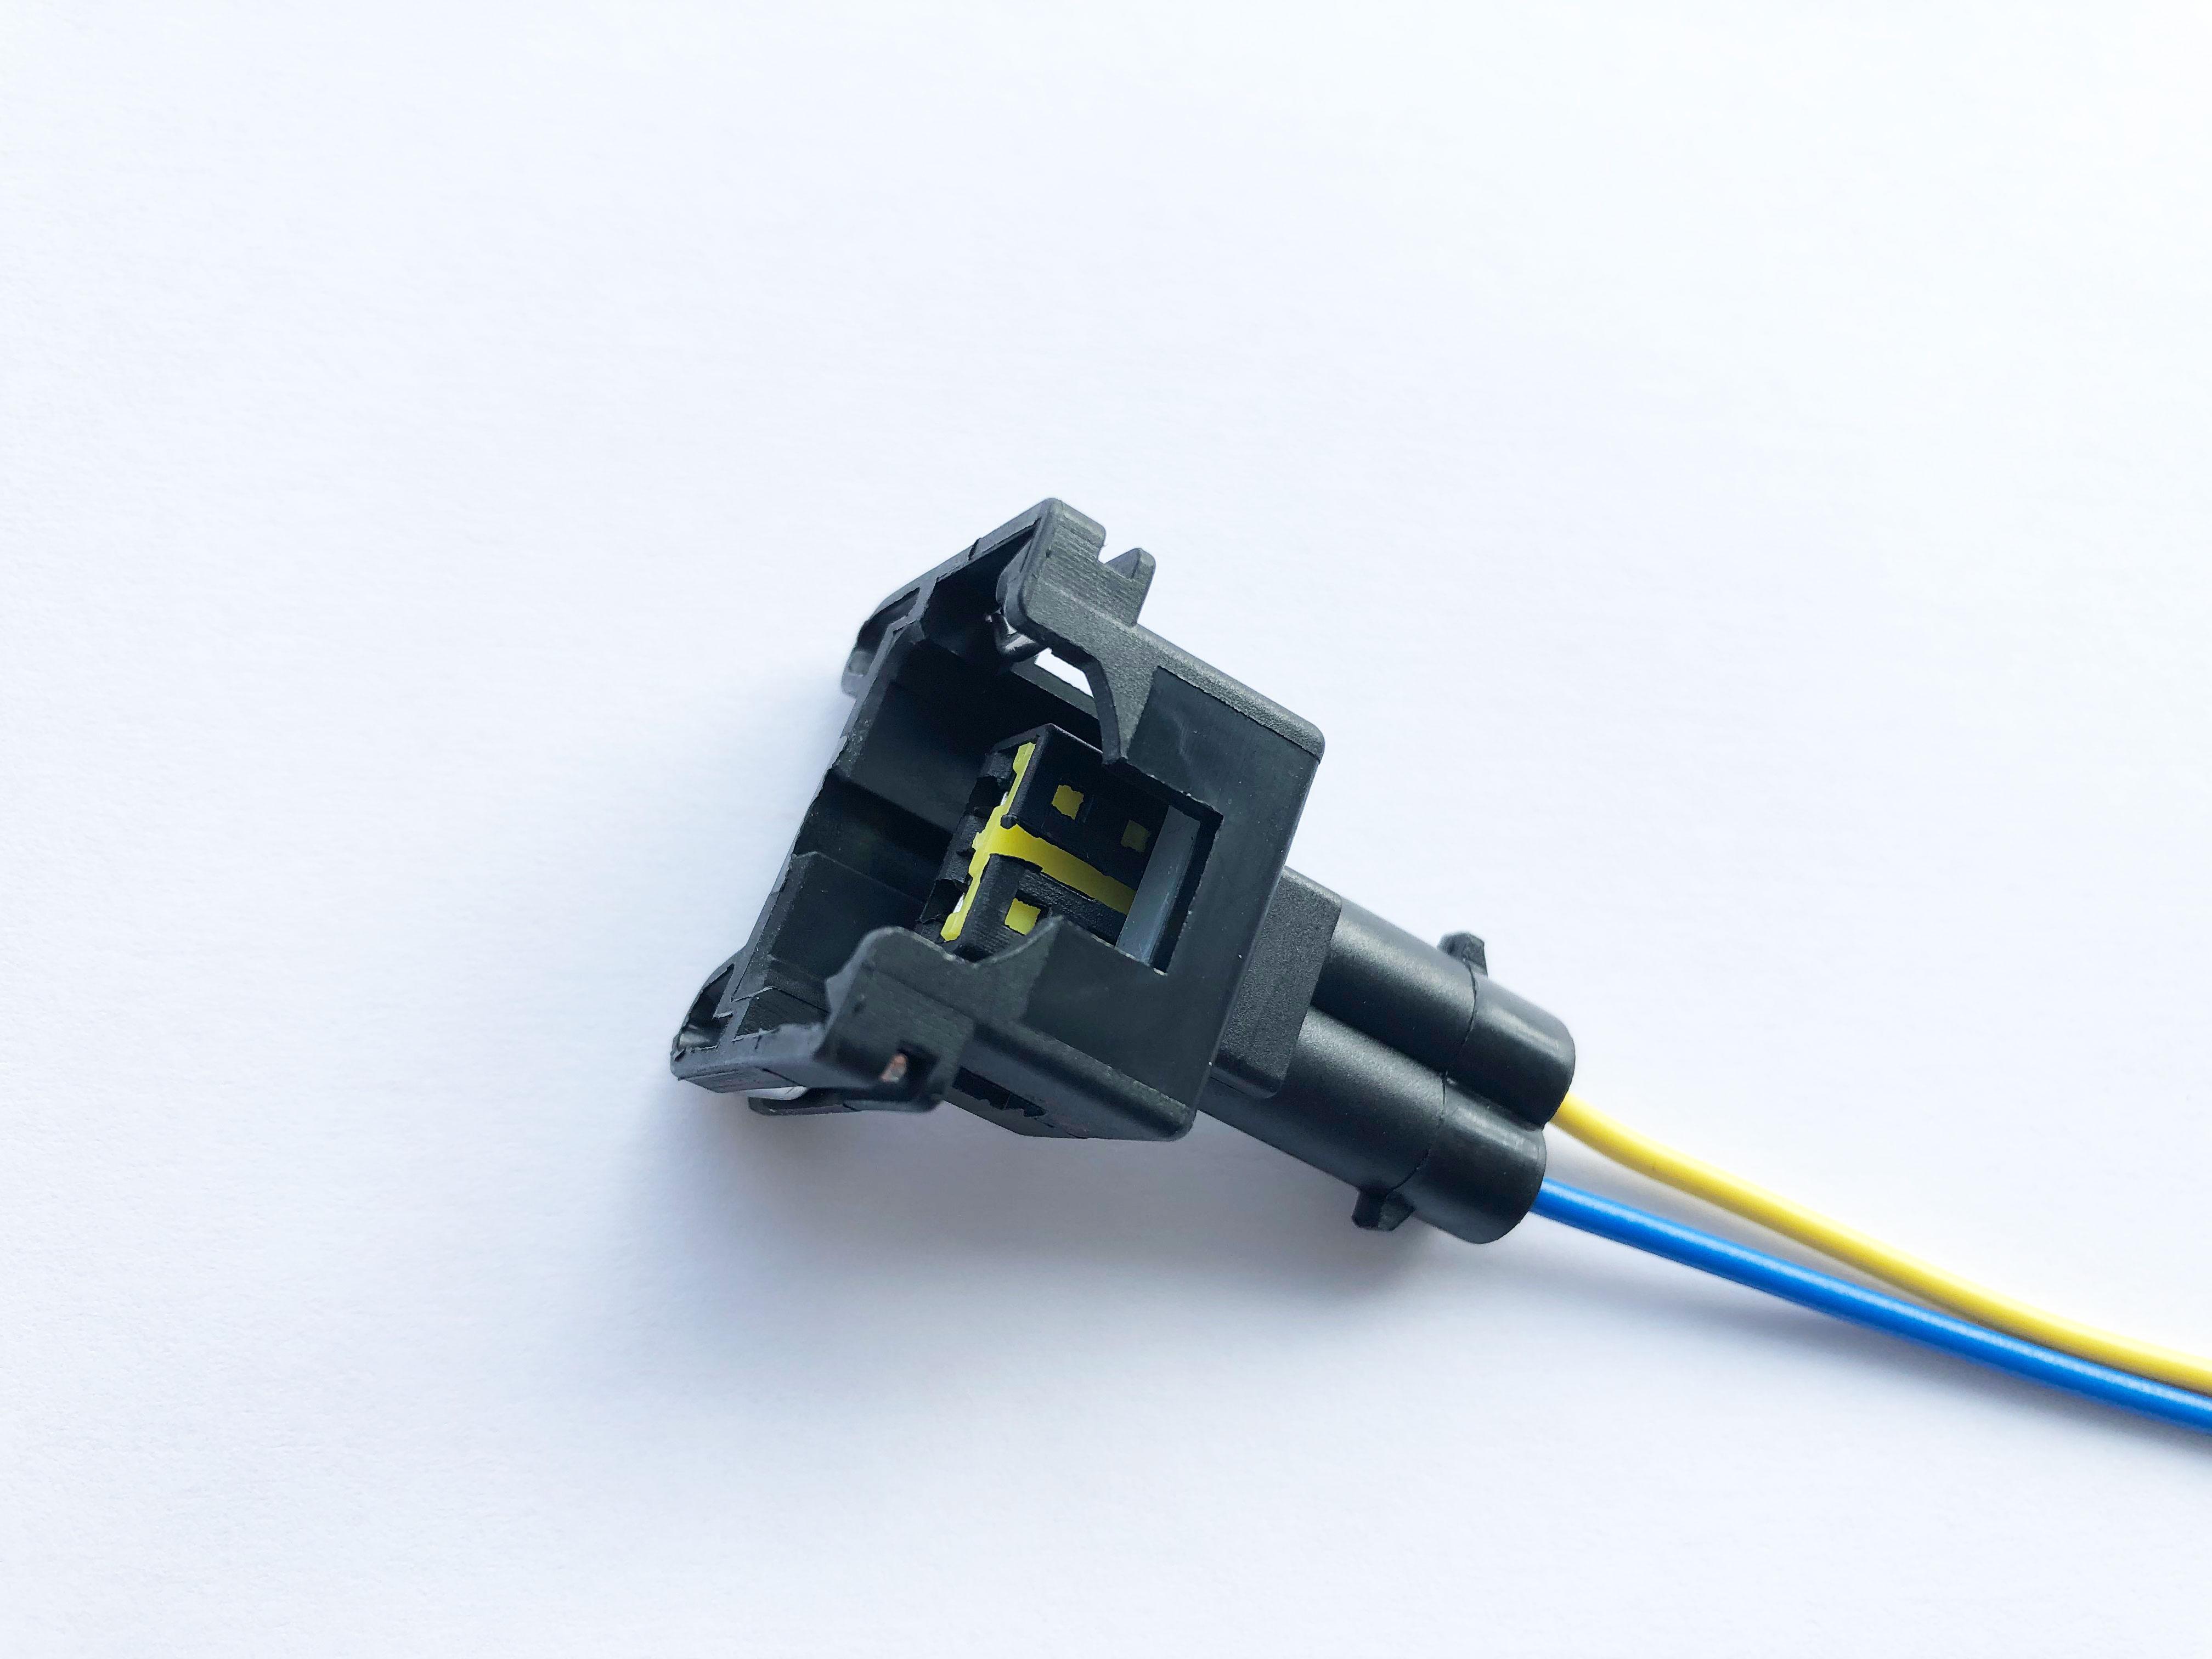 Enjektör  Soketi - Bora - Golf 4 - Toledo AKL Motor